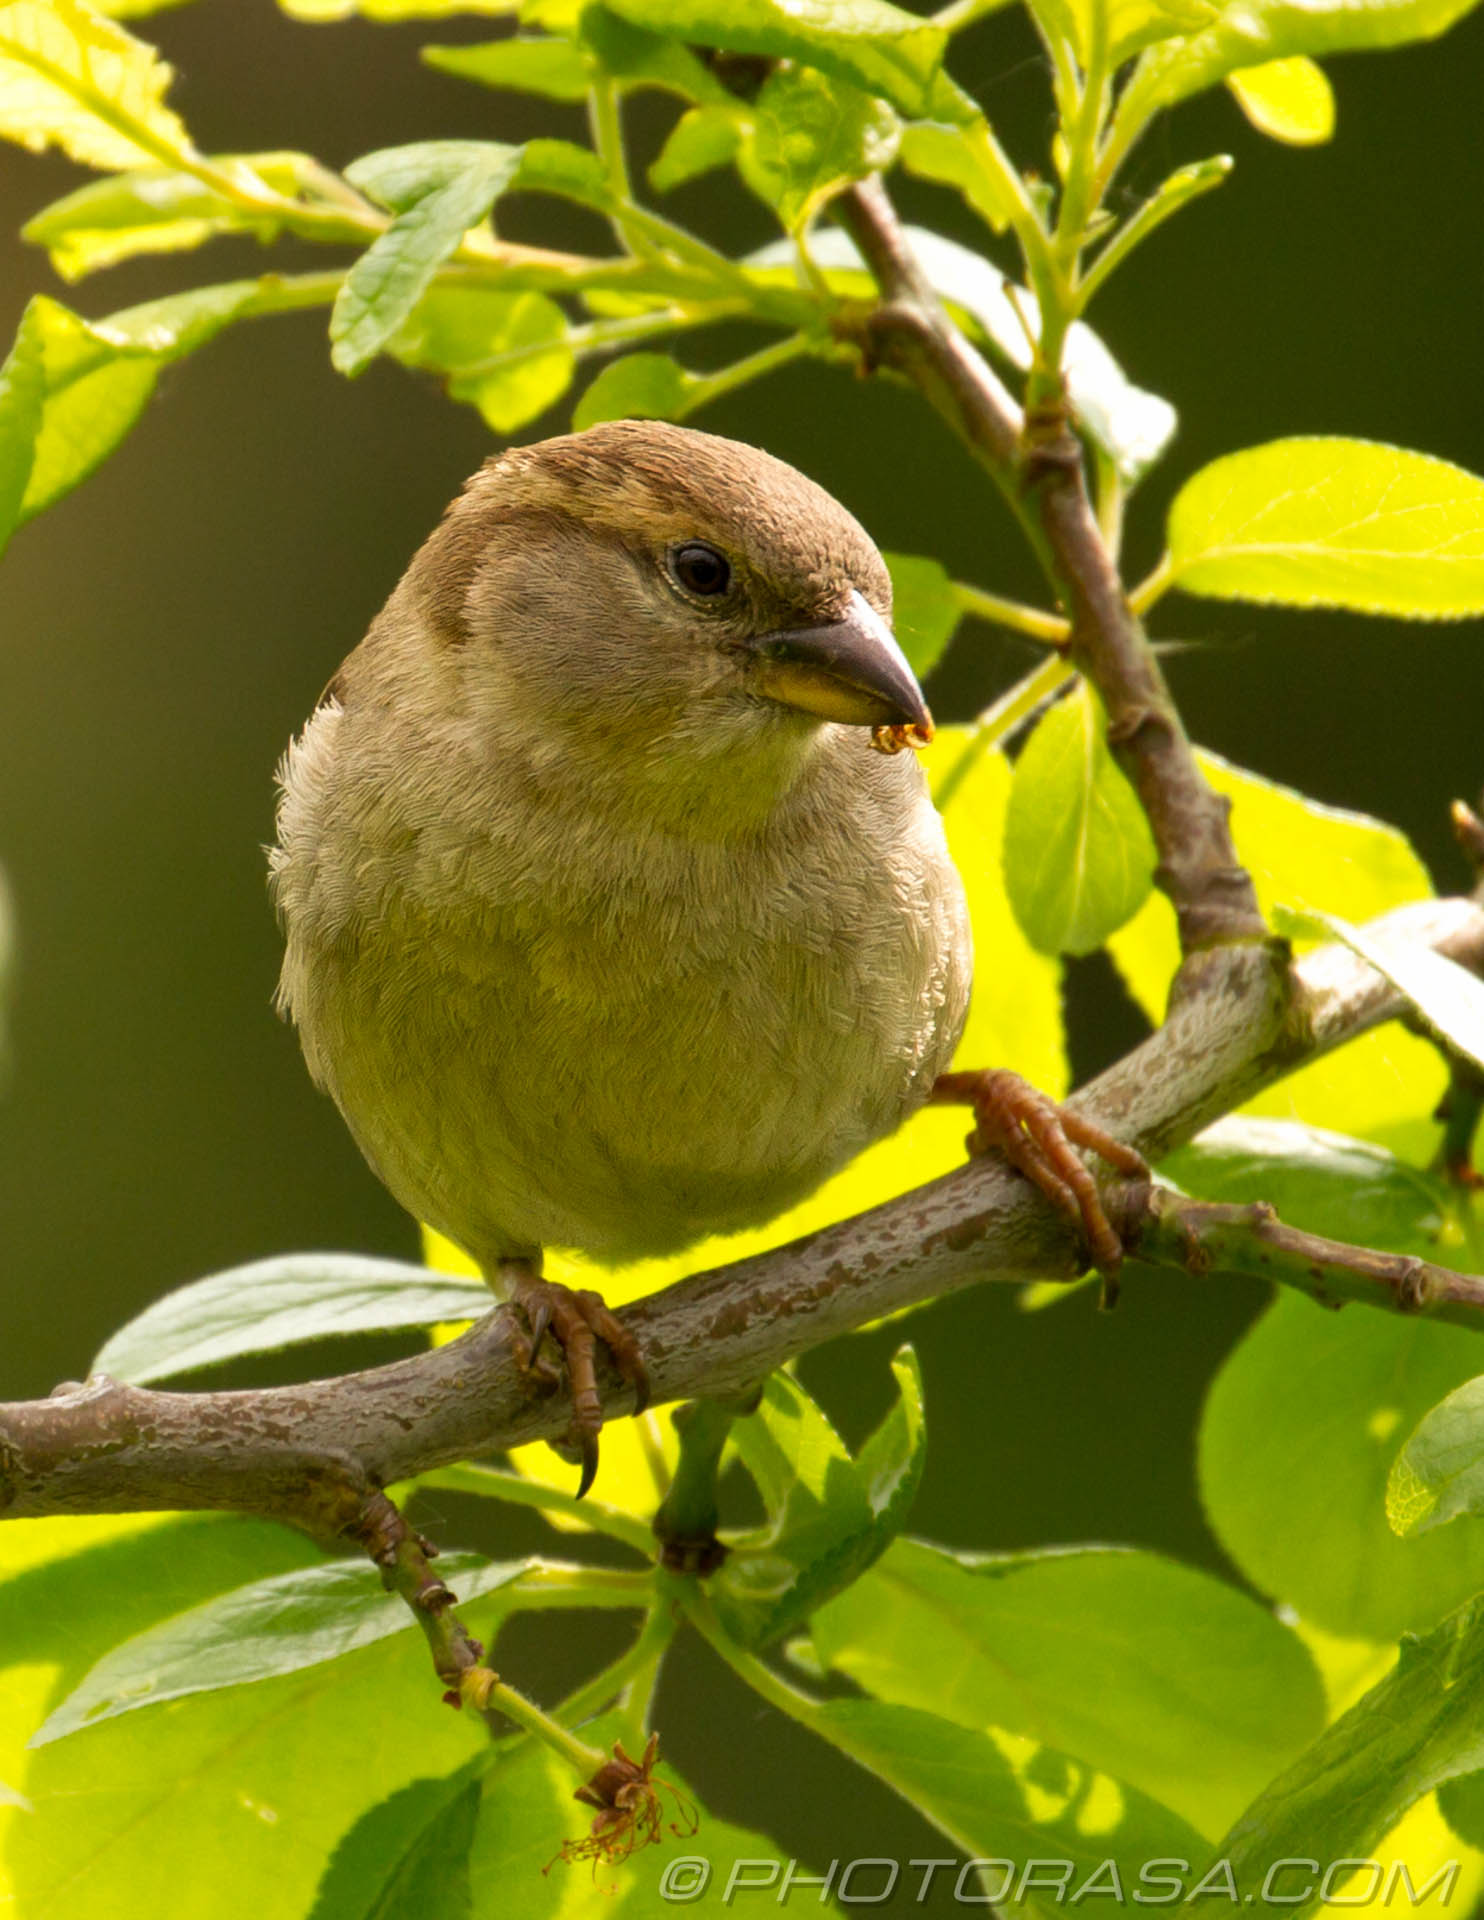 http://photorasa.com/sparrows/house-sparrow-in-tree/